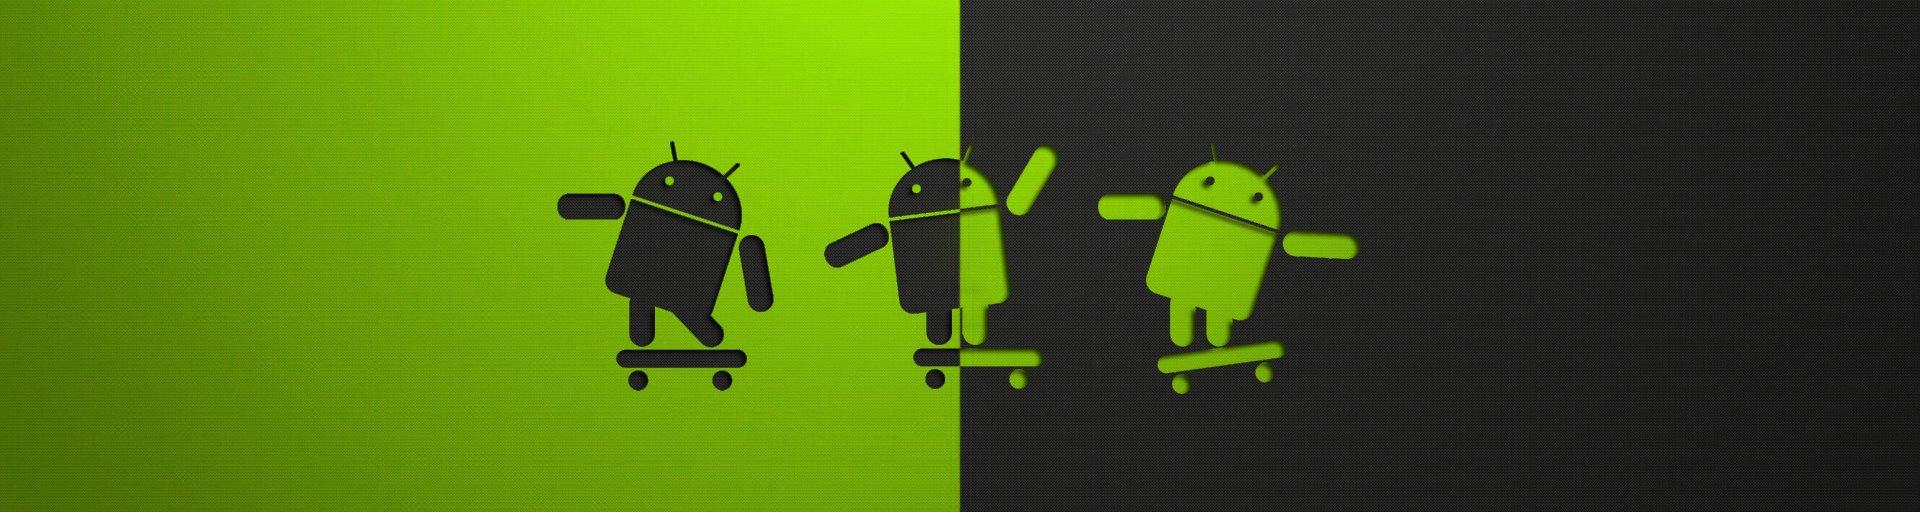 Додавання української в Android: легкий шлях feature image